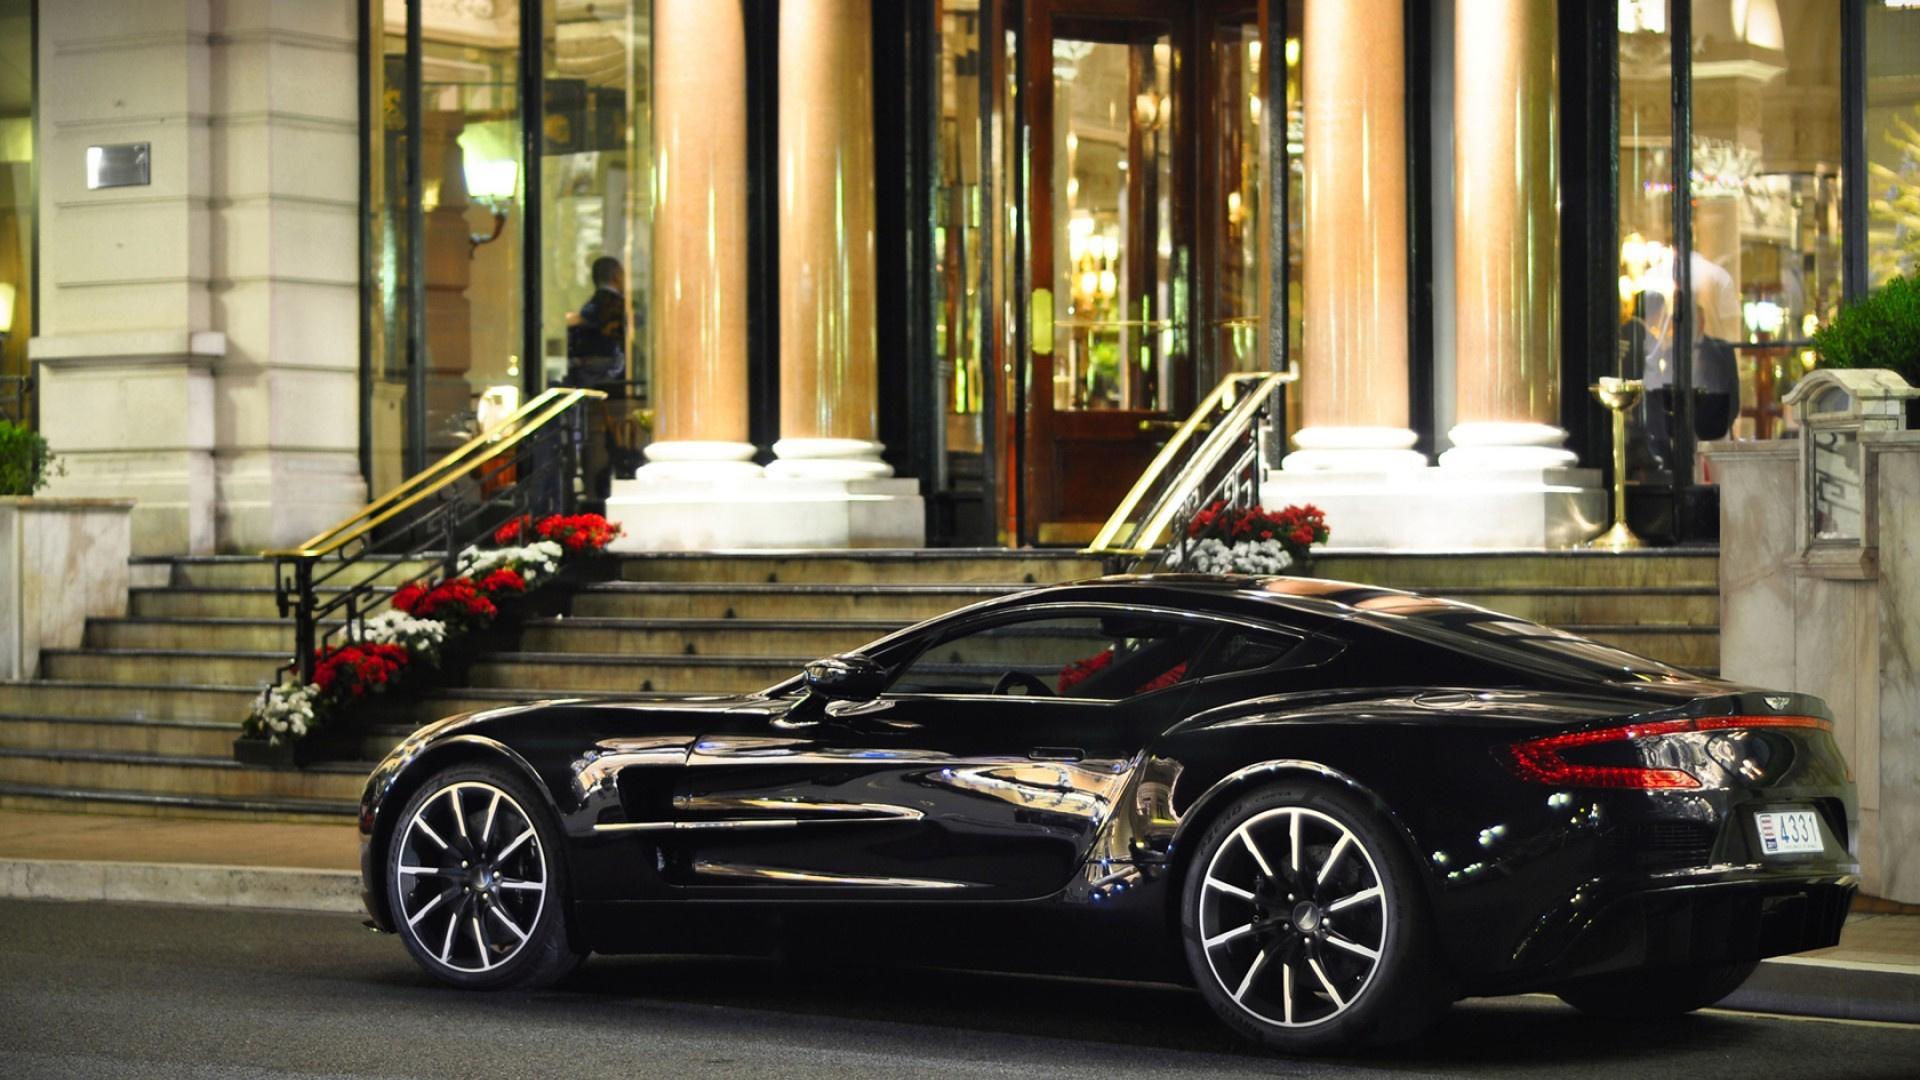 Aston Martin суперкар ночь город  № 2374815 бесплатно